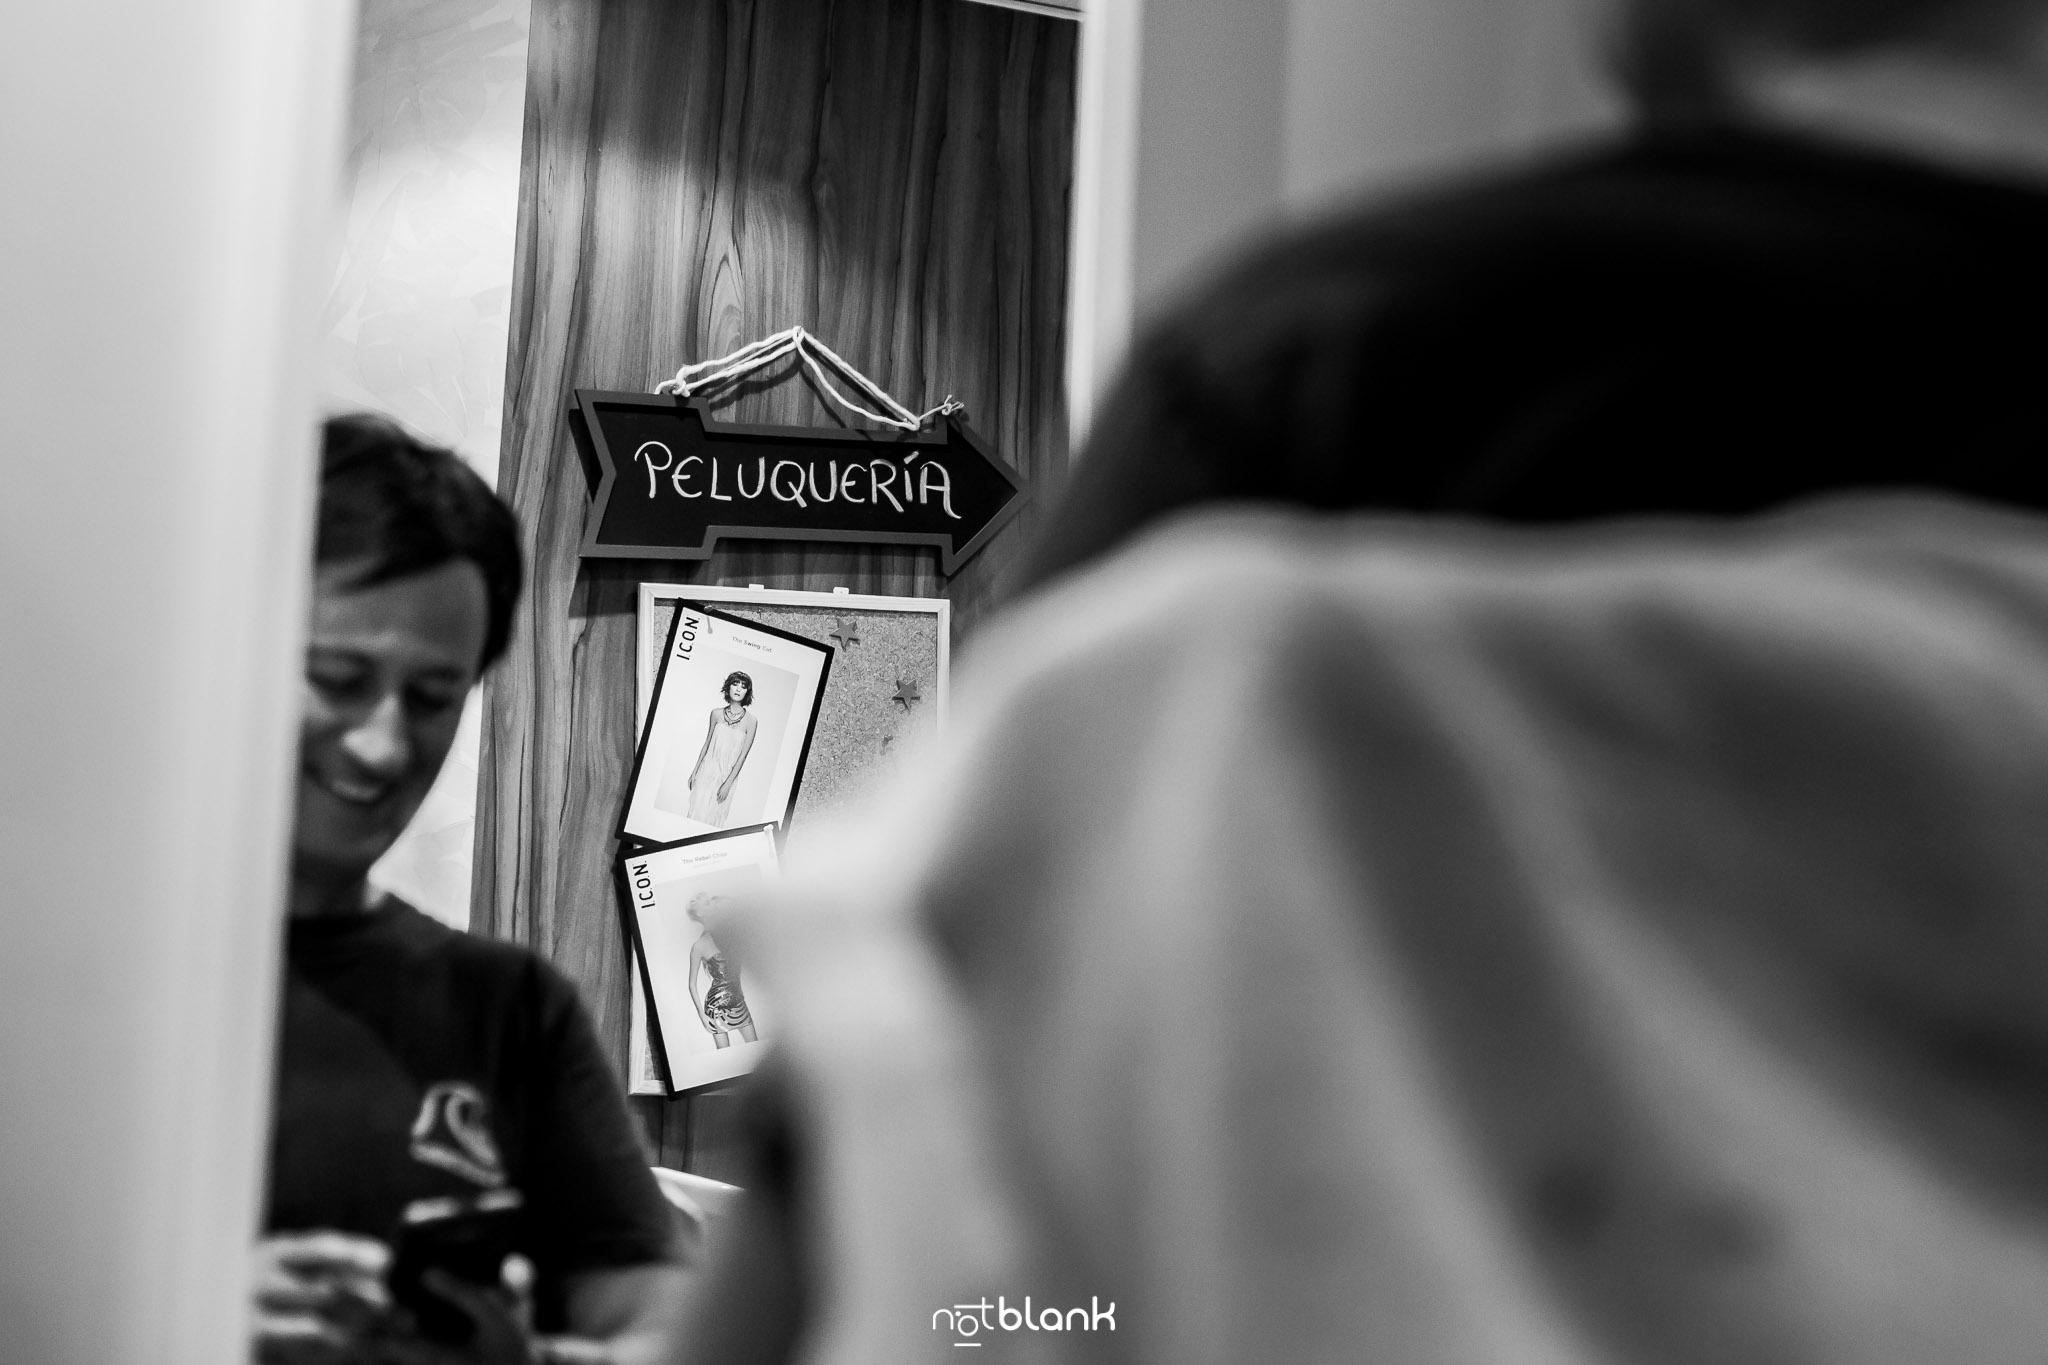 Boda-Mondariz-Balneario-Preparativos-Peluquería-Novio-Peluquera-Fotógrafo de boda